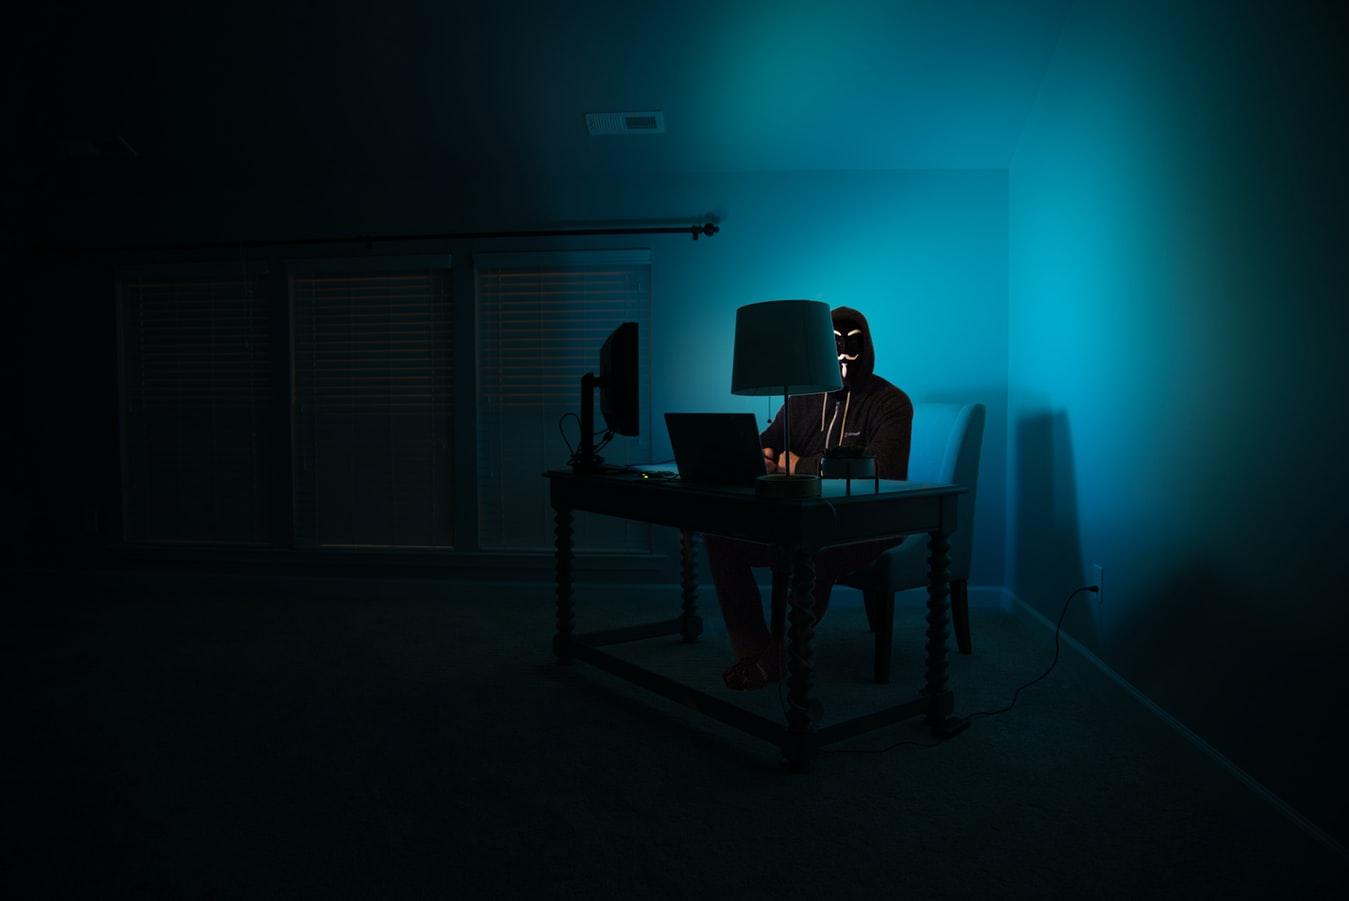 resim, hacker, hack